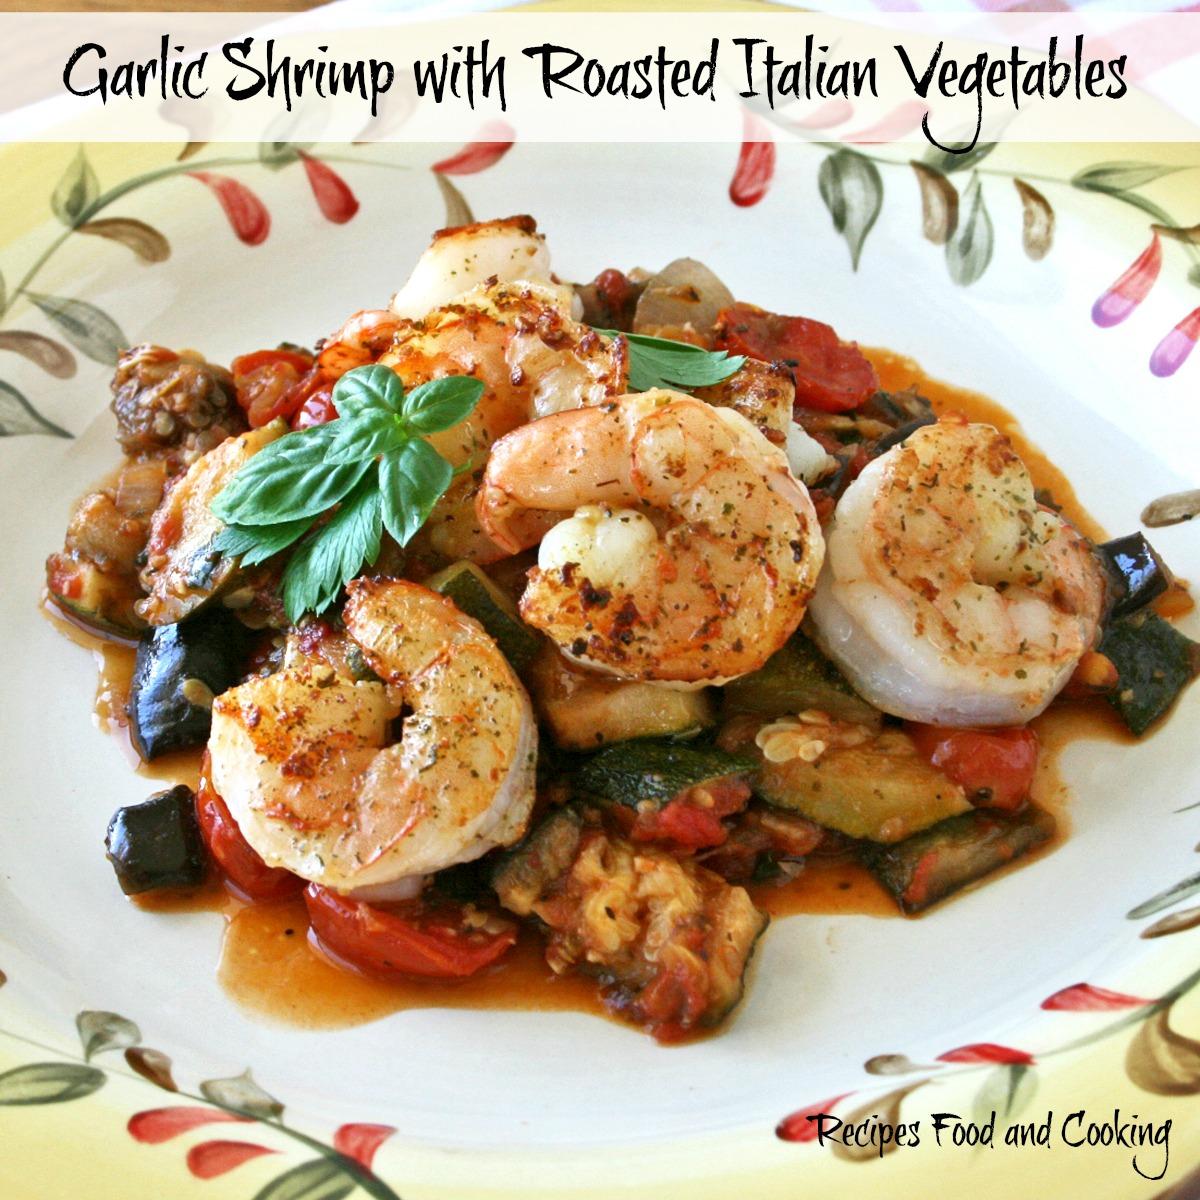 garlic-shrimp-roasted-italian-vegetables-f